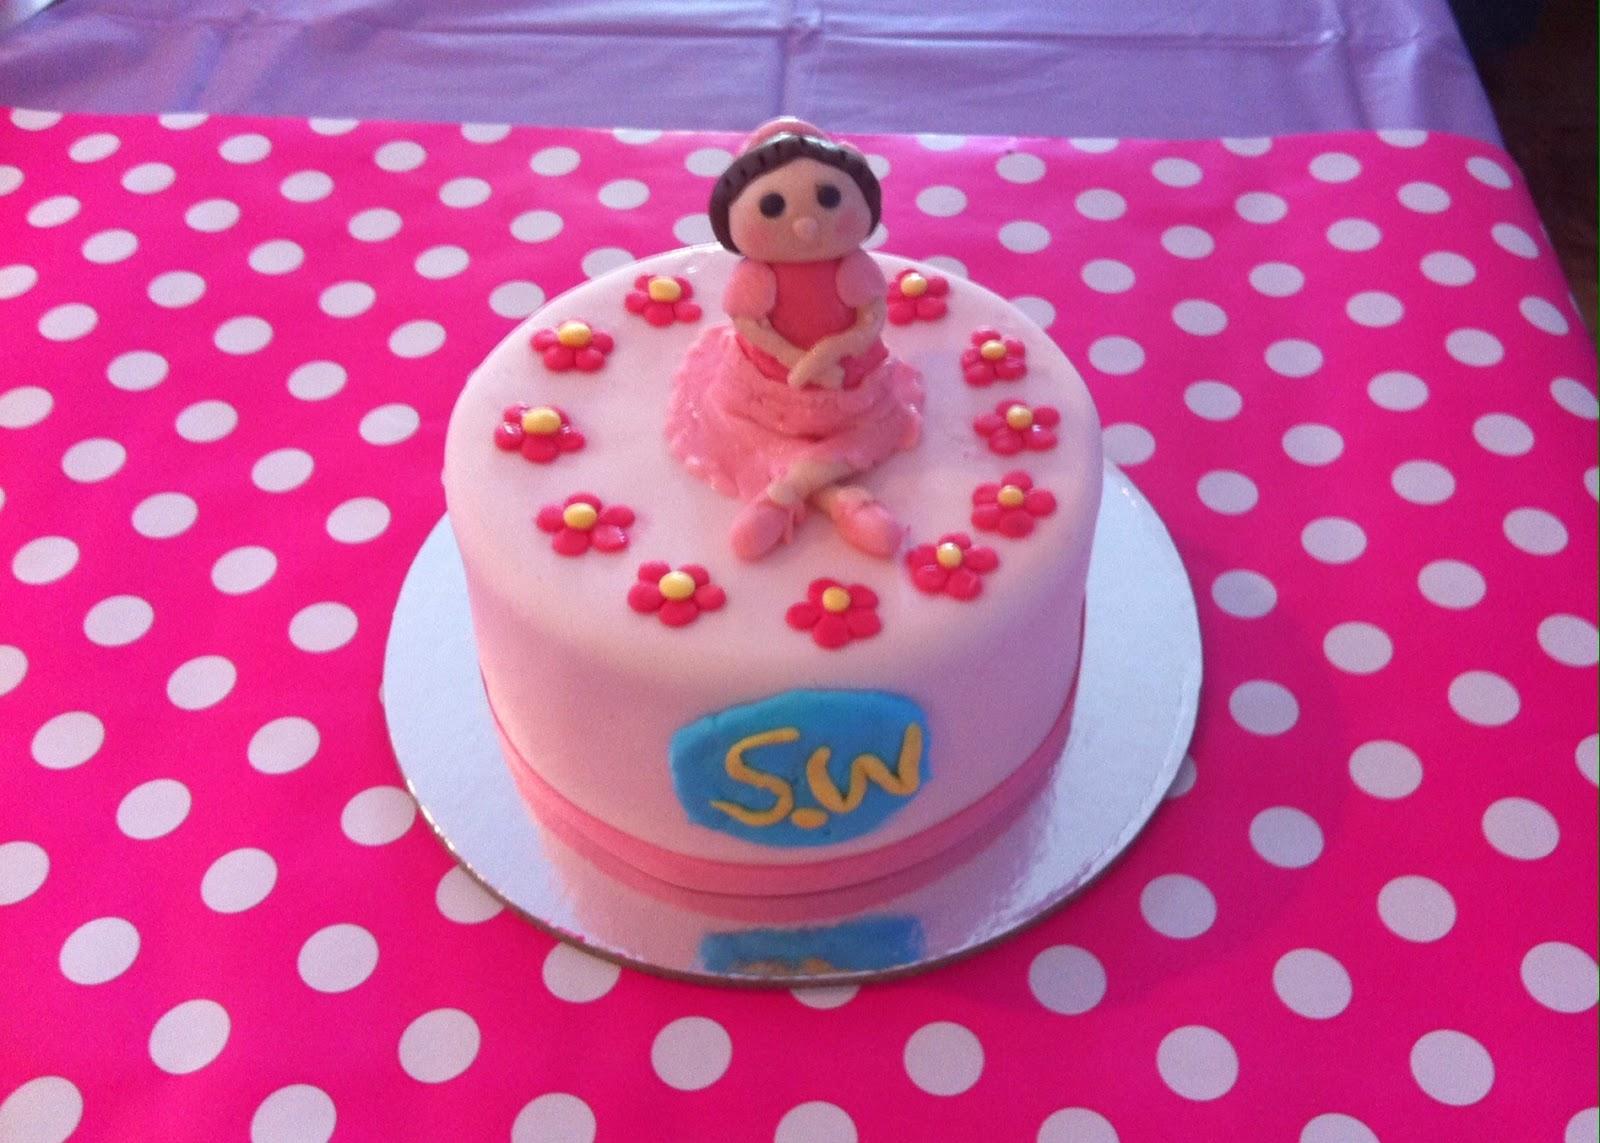 http://elegantcakesandpartydates.blogspot.com.au/2013/12/ballerina-cake-decorating-birthday.html